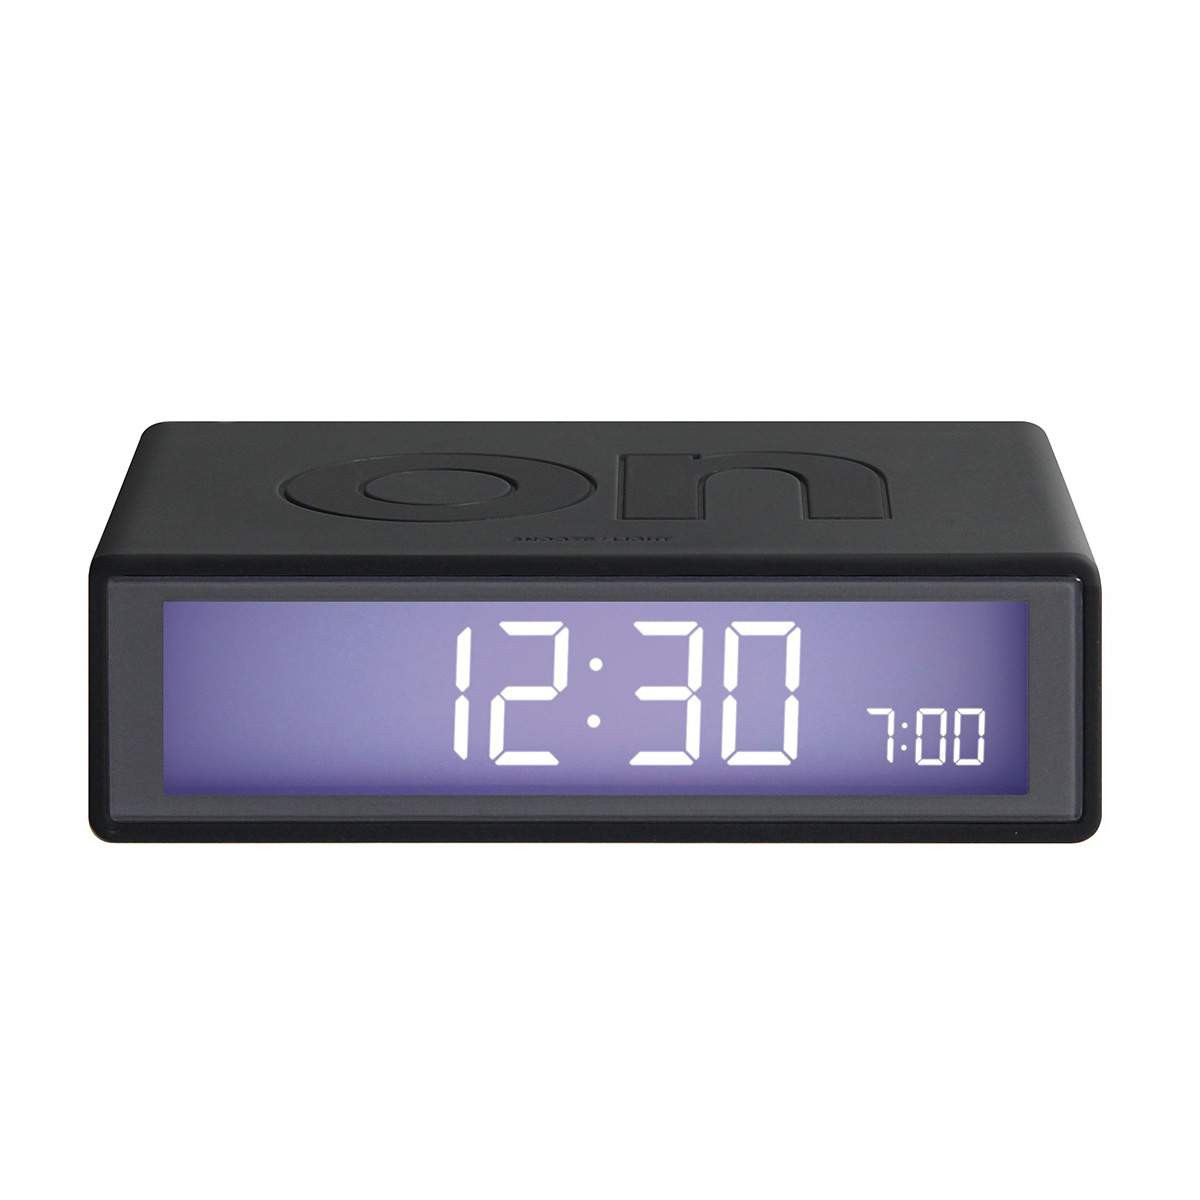 LEXON Flip LCD alarm clock LR130G3 dark grey | the design gift shop